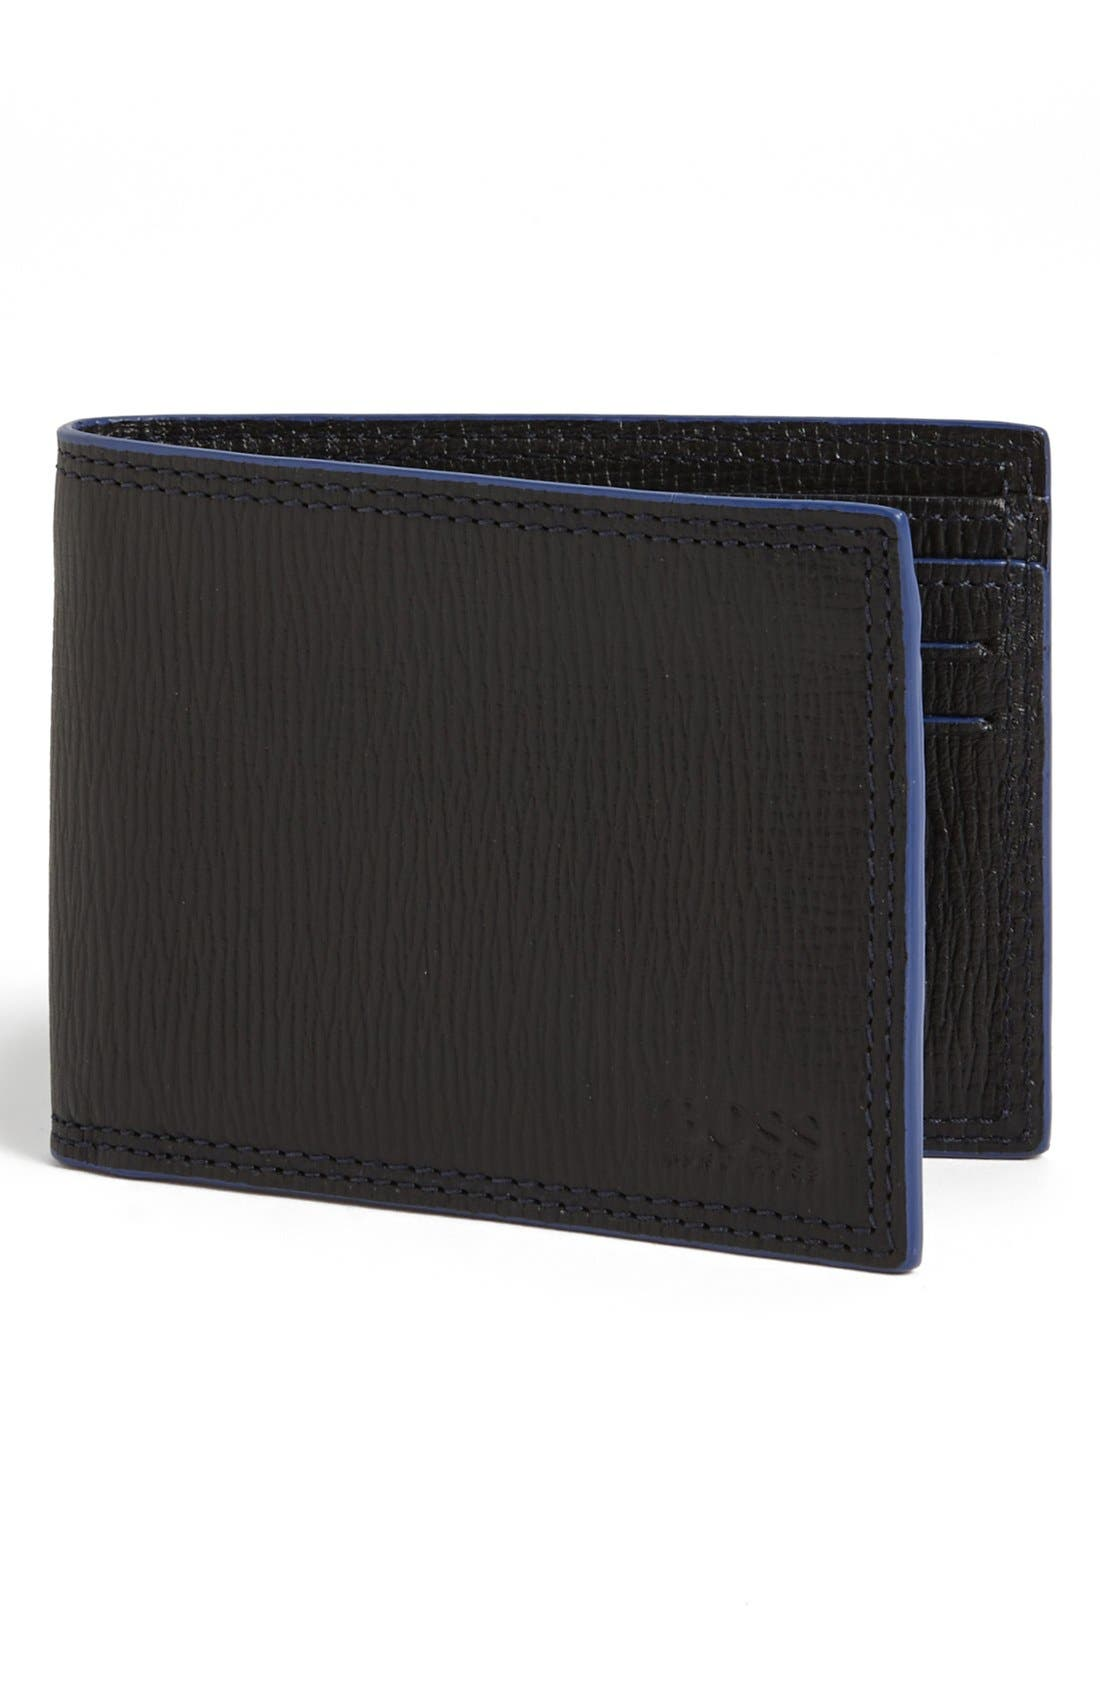 Main Image - BOSS HUGO BOSS 'Prenson' Wallet